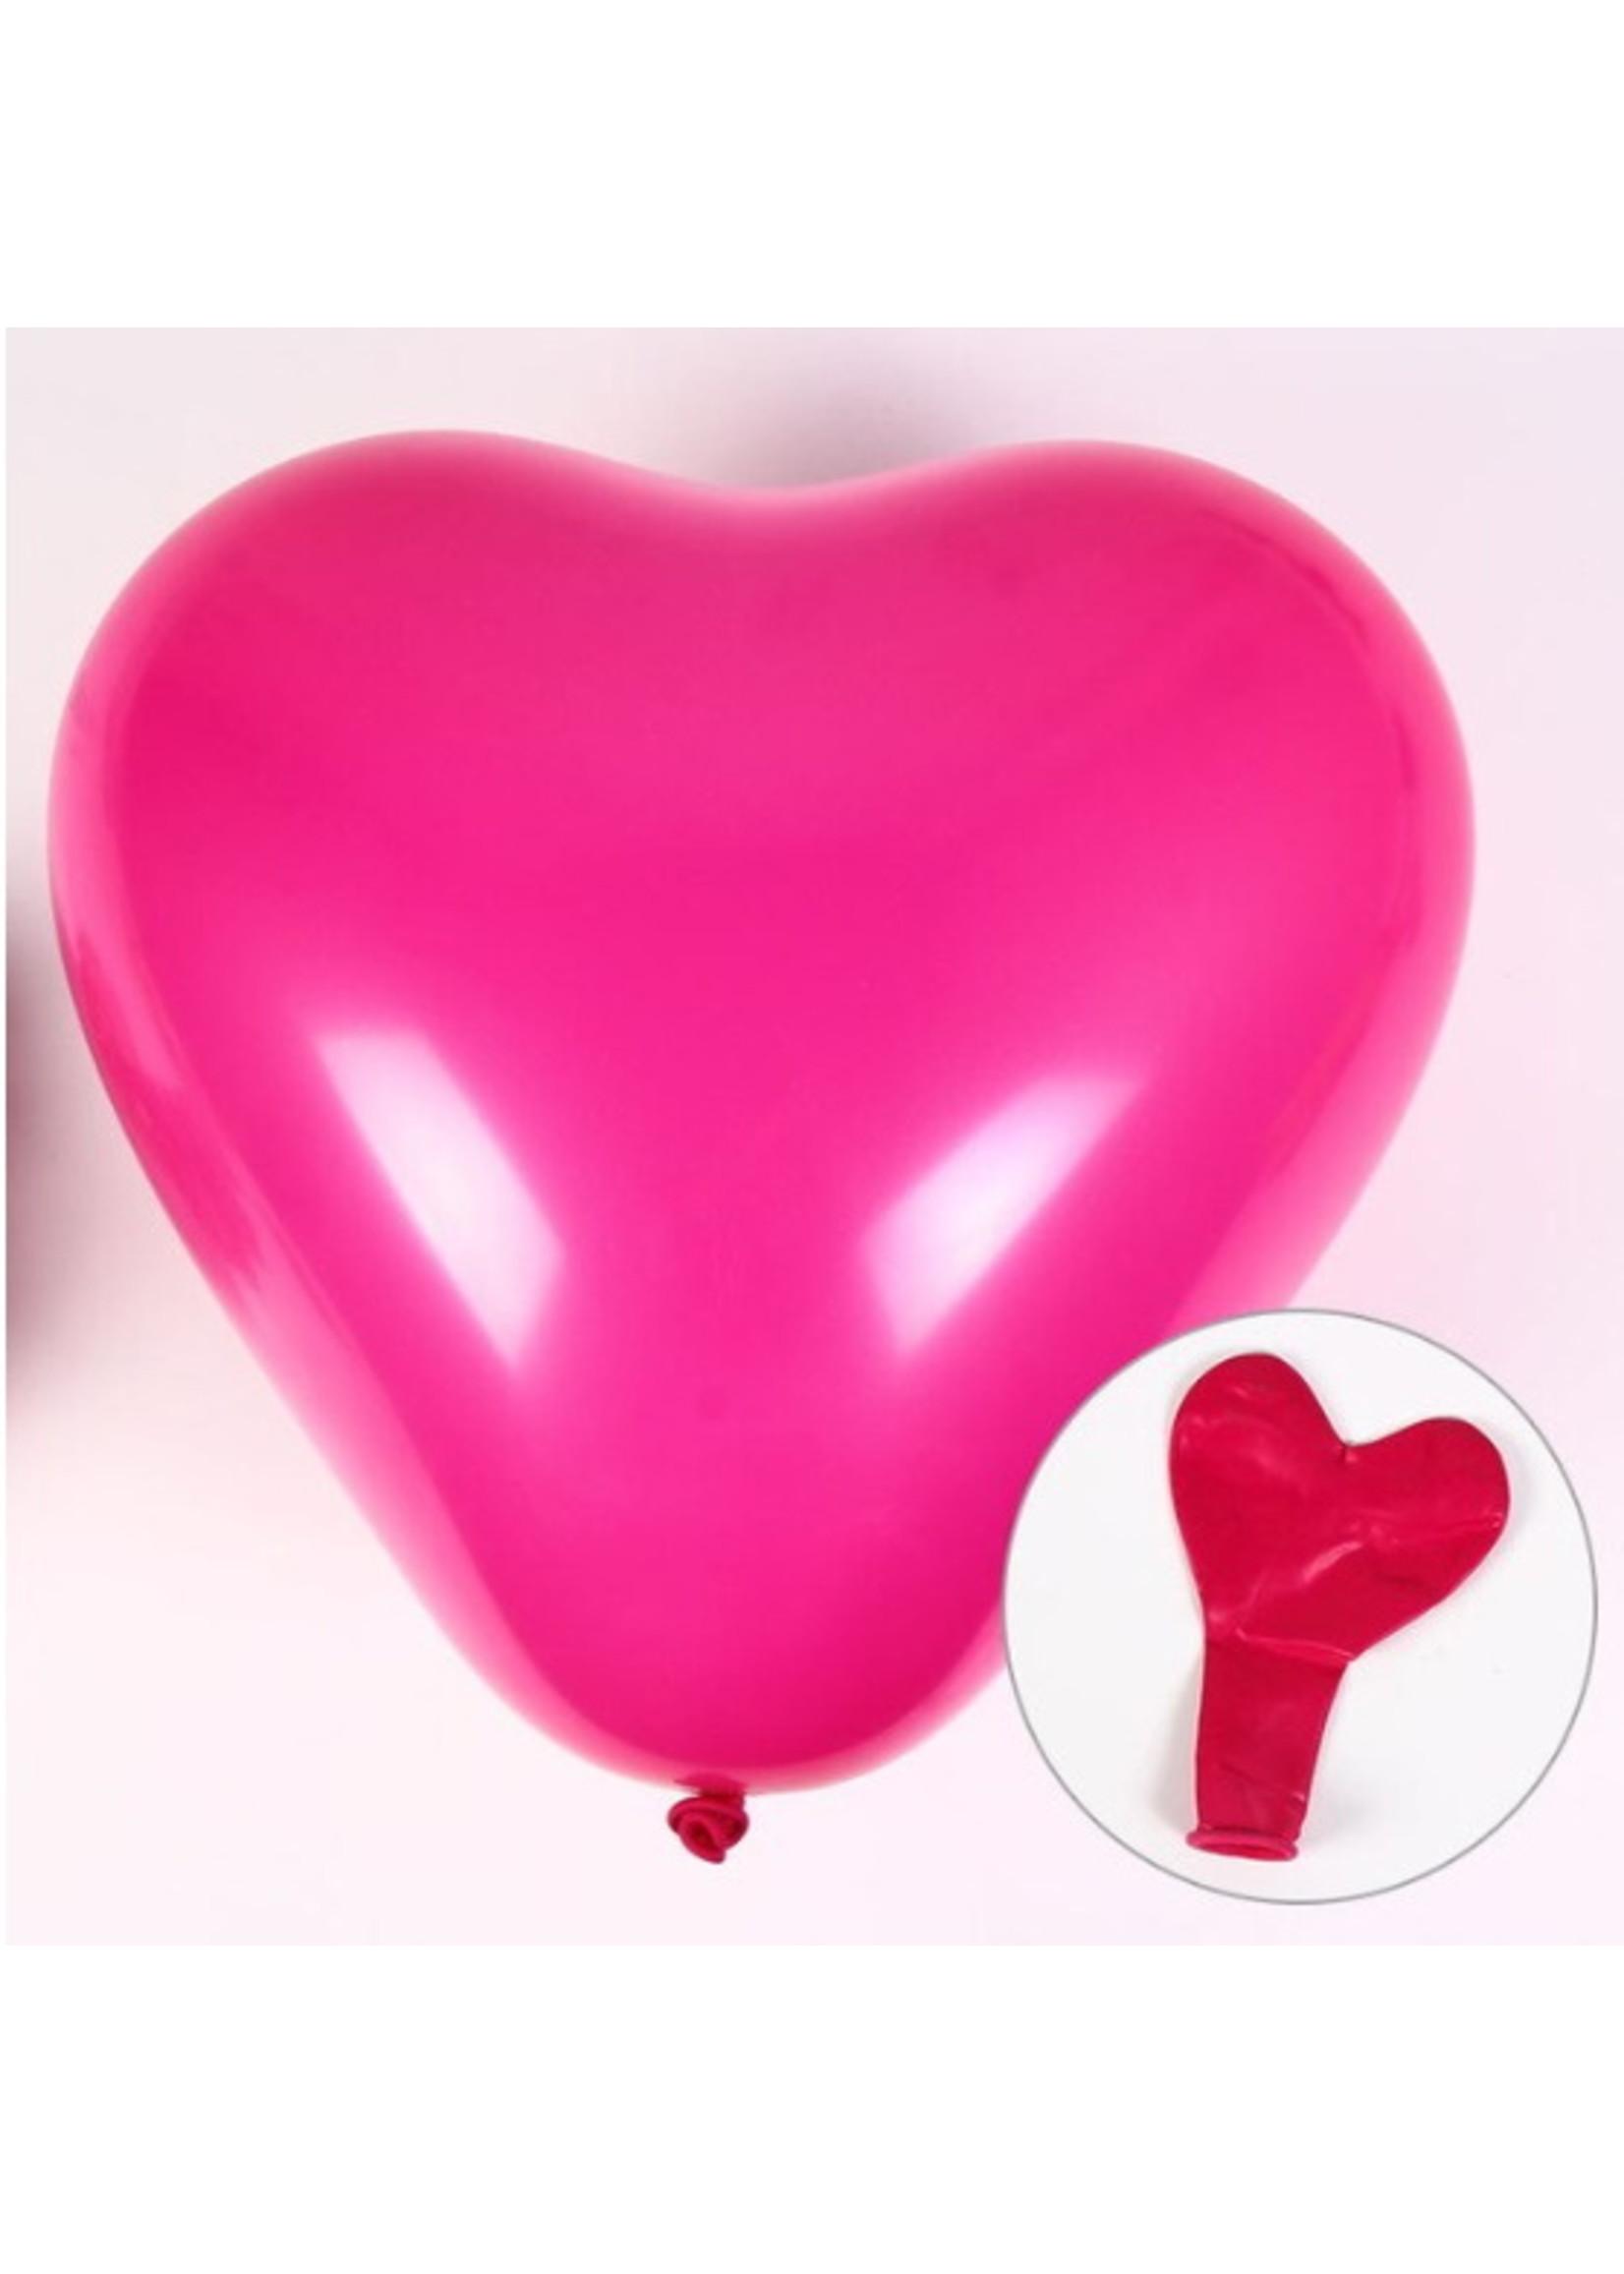 Annienas hart ballon